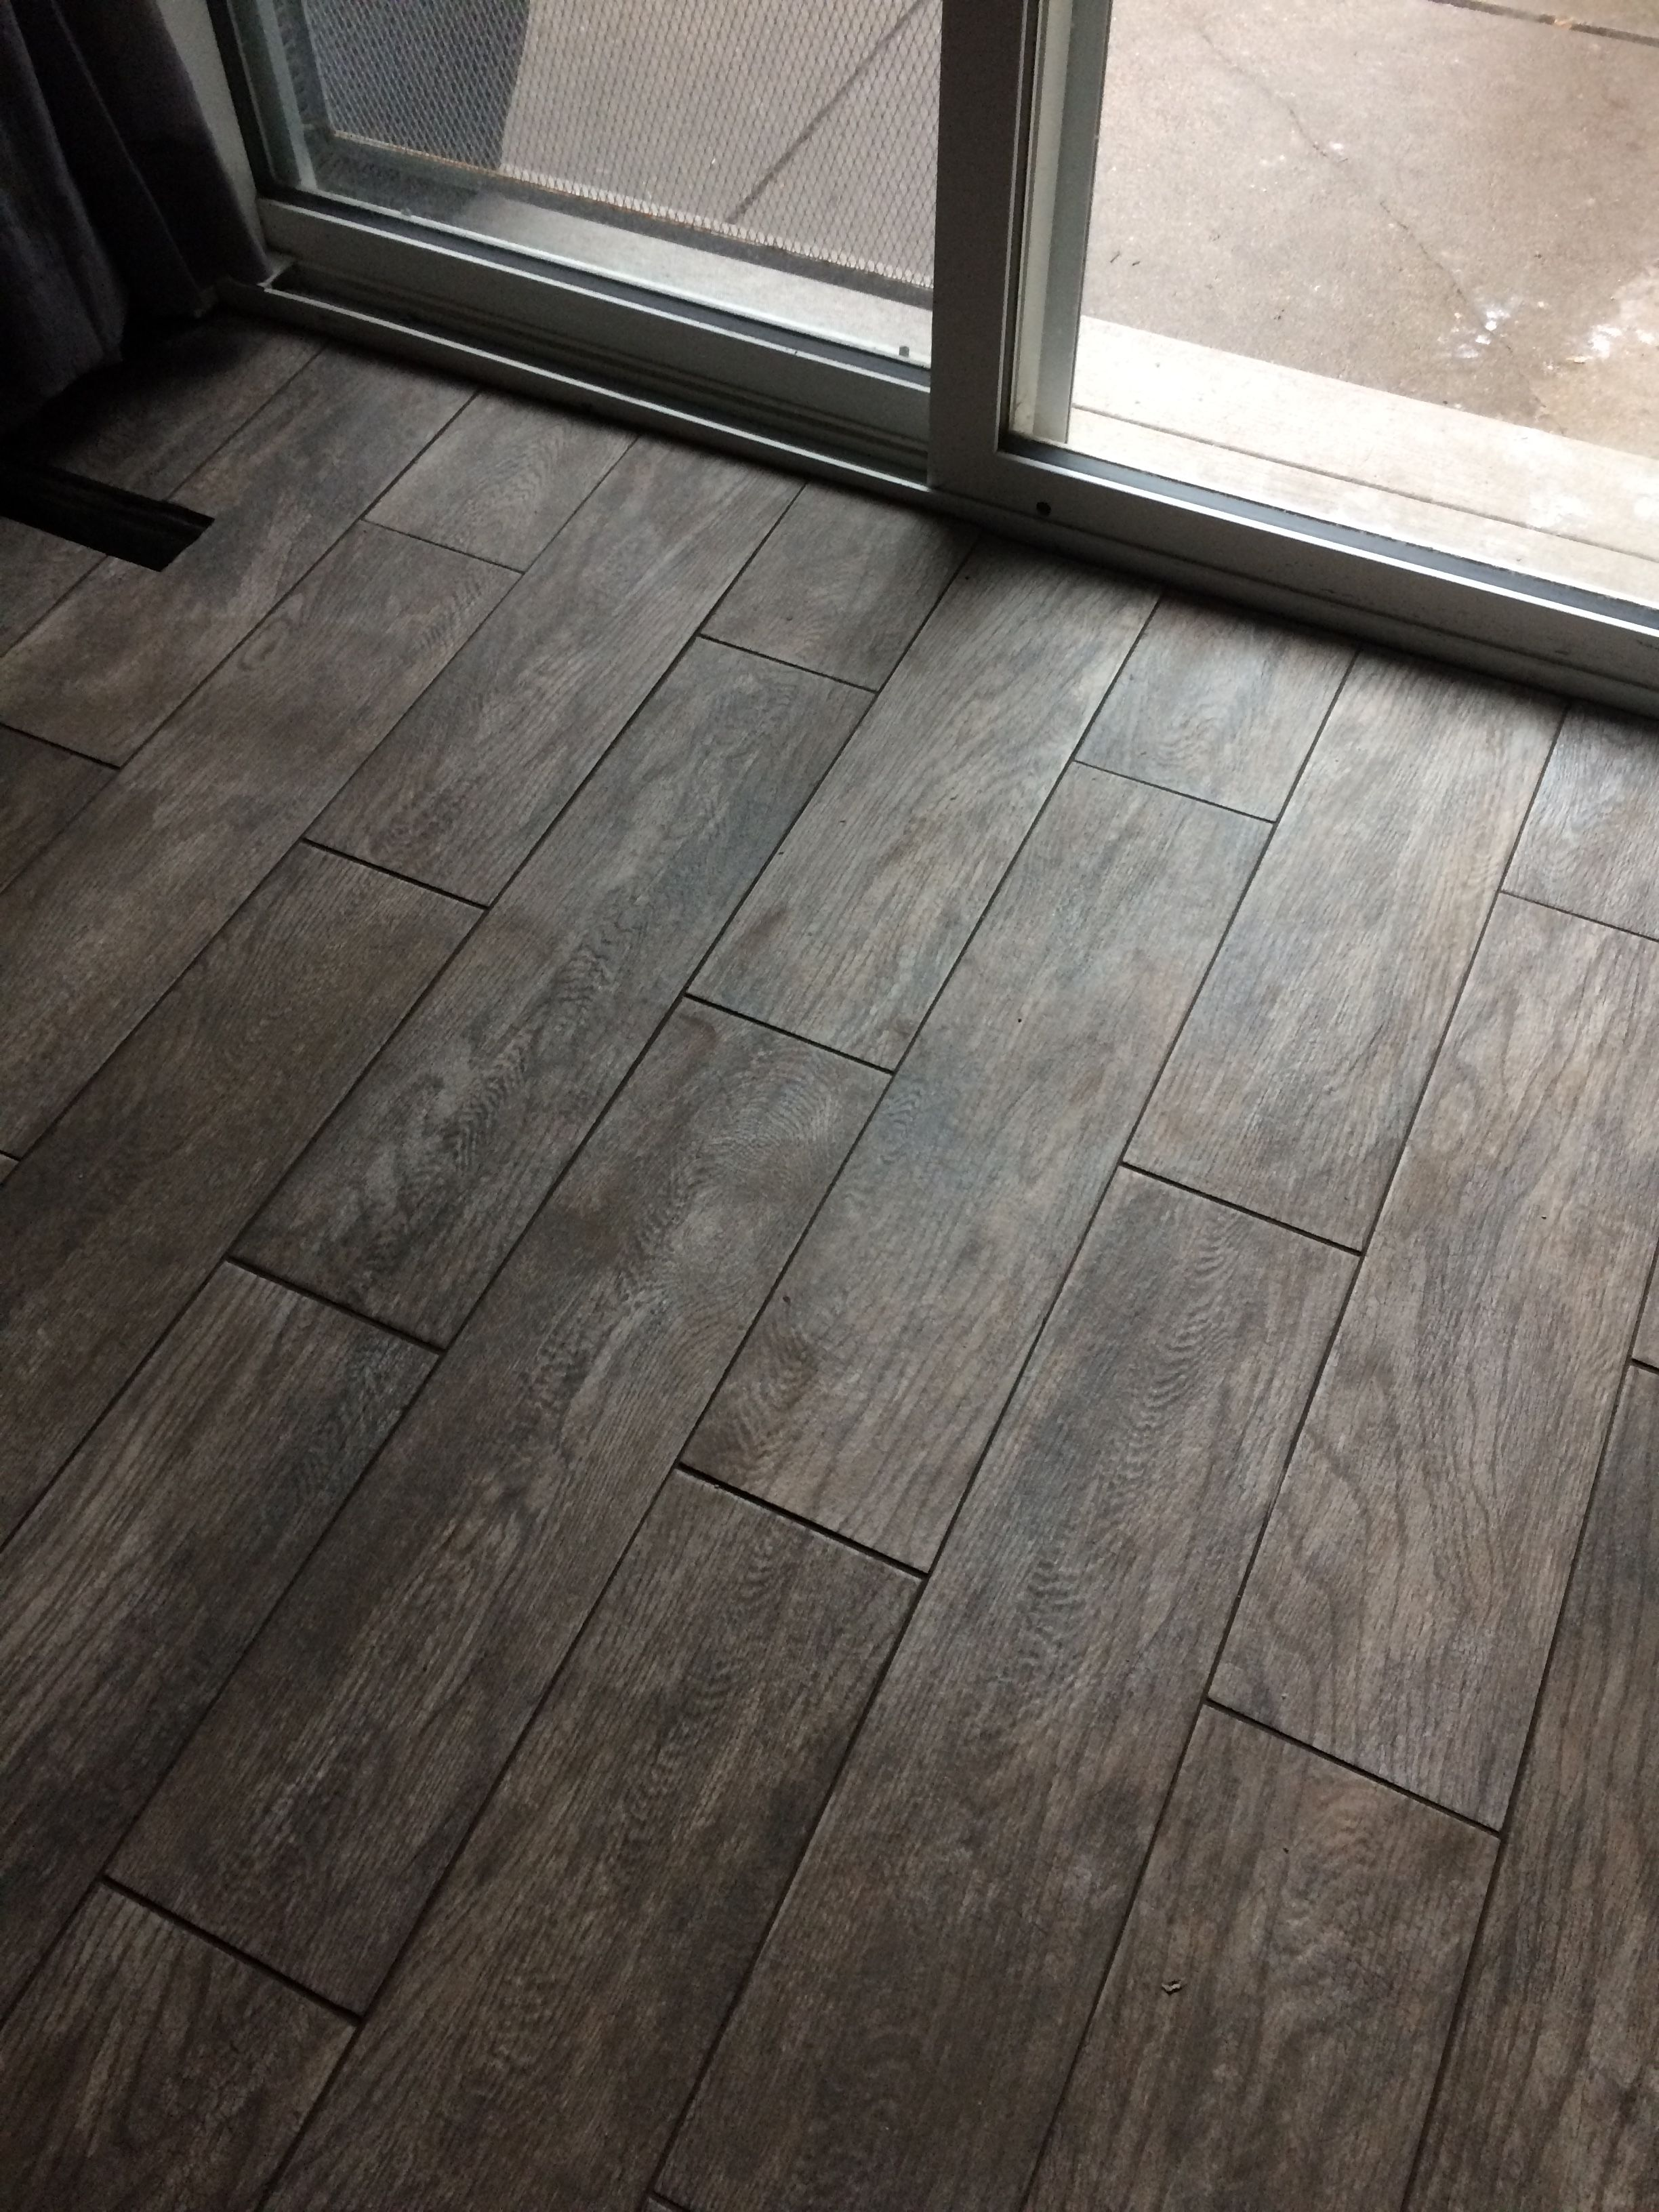 Rustic Bay Porcelain tile from Home Depot Home decor